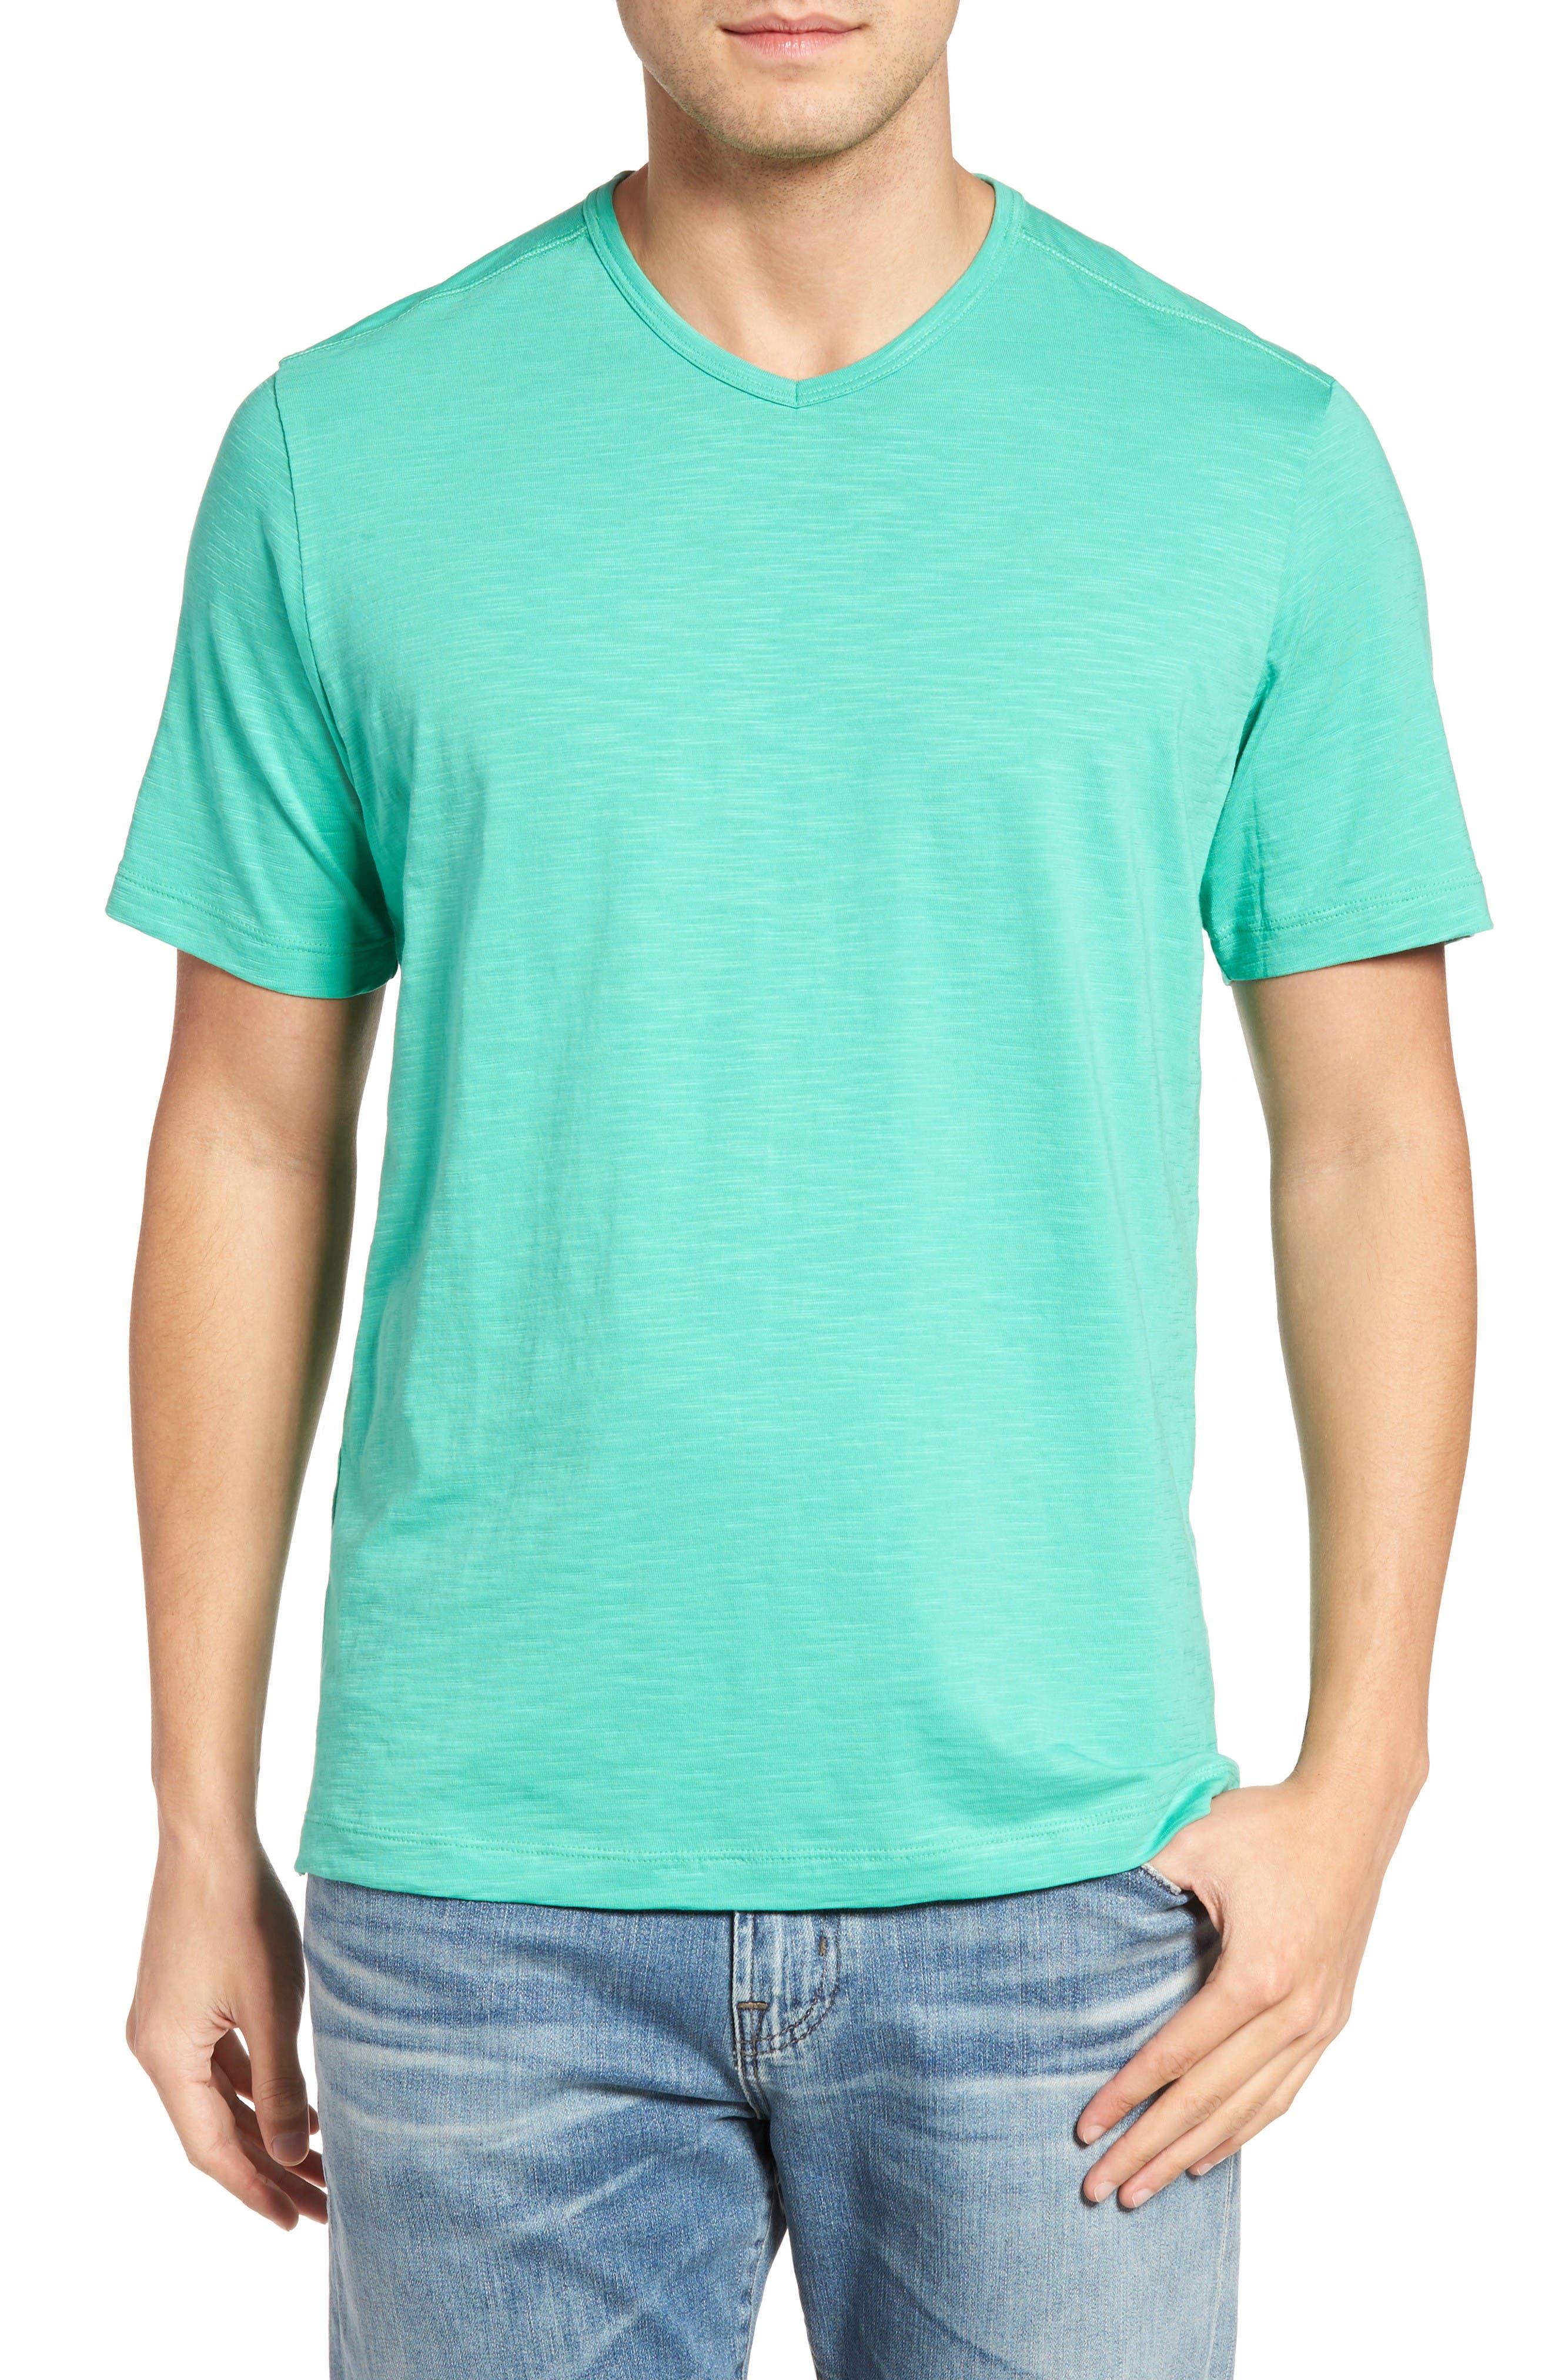 Tommy Bahama Portside Player V-Neck T-Shirt (Big & Tall)